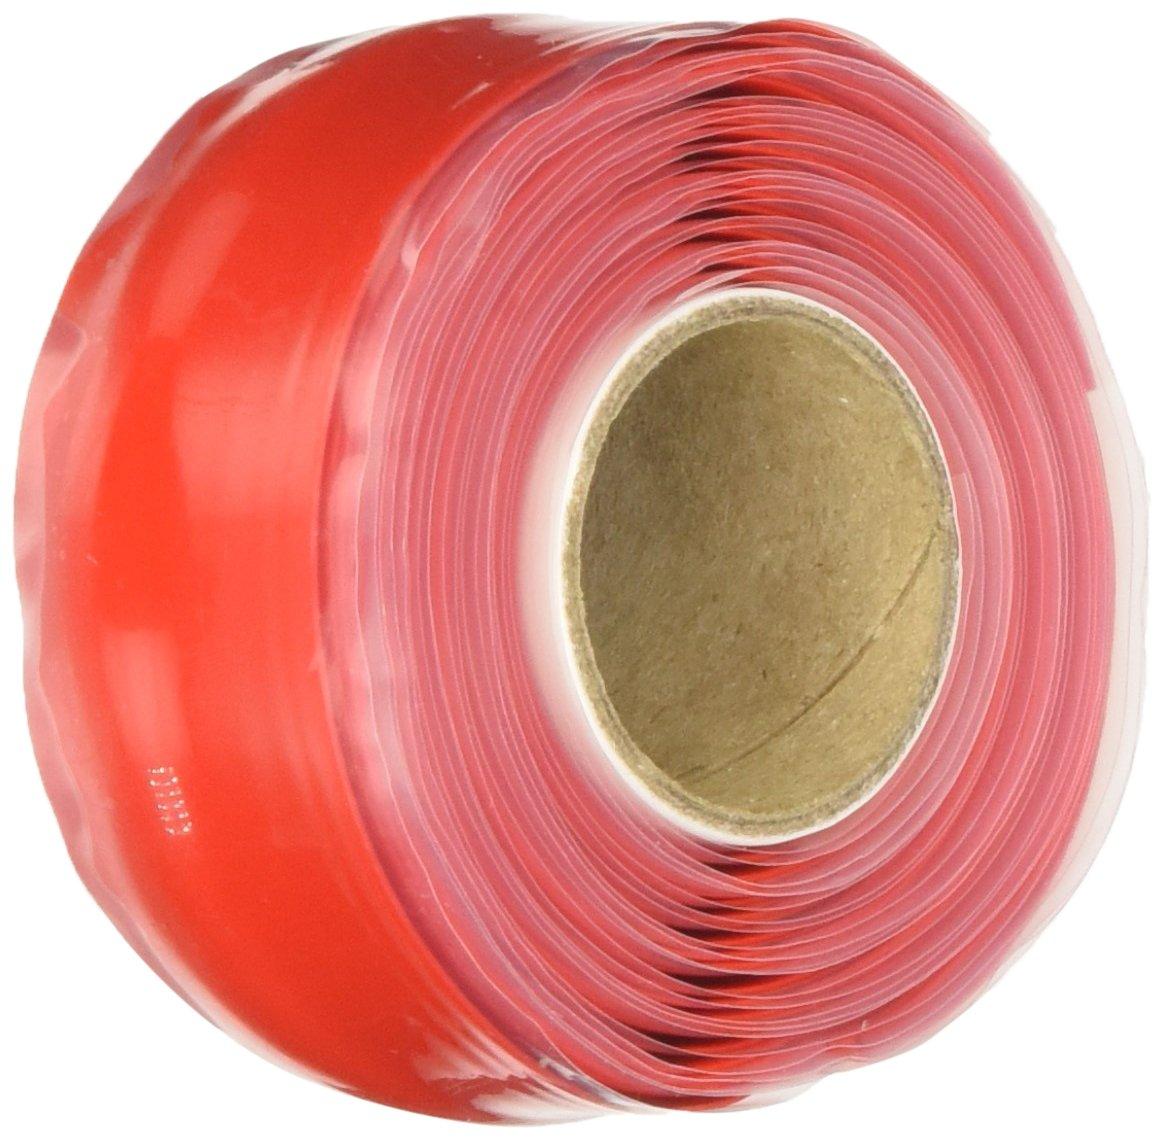 idroblok 0101962522i-bl Idro Extreme Tape Self Coiling Agglomeration, 25x 3ml, Red